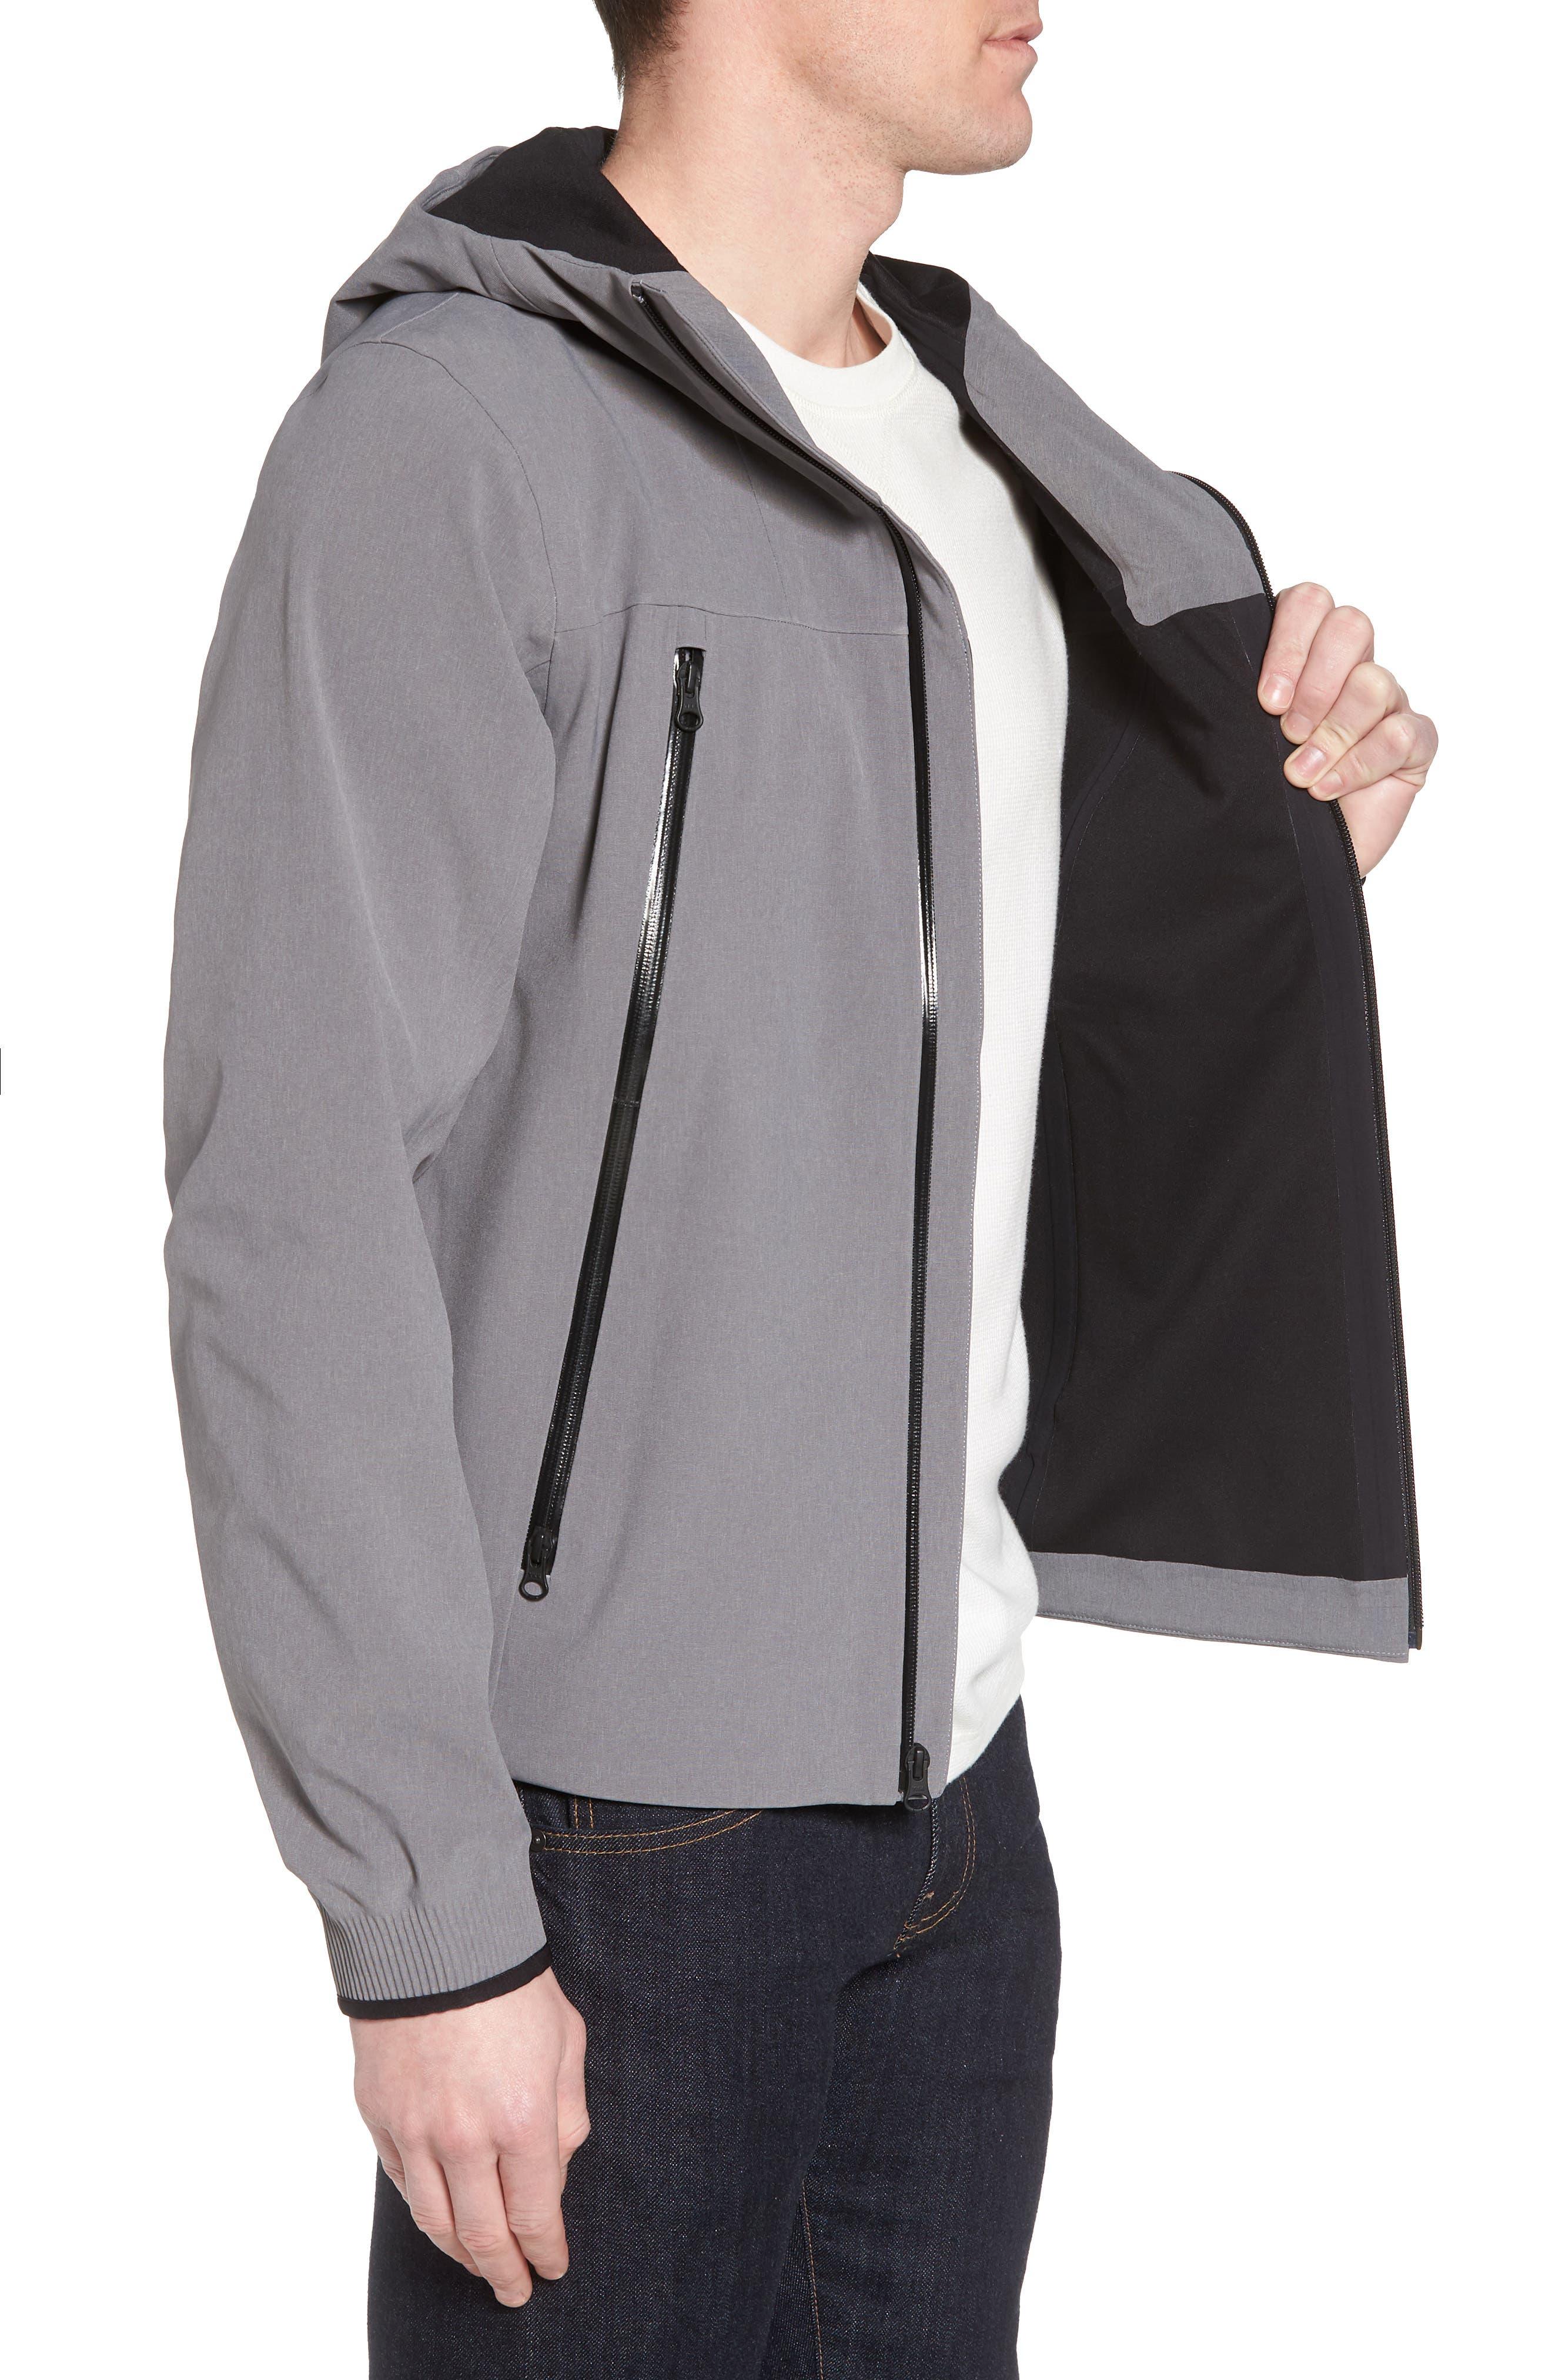 Apex Flex Gore-Tex<sup>®</sup> Waterproof Jacket,                             Alternate thumbnail 3, color,                             Medium Grey Heather